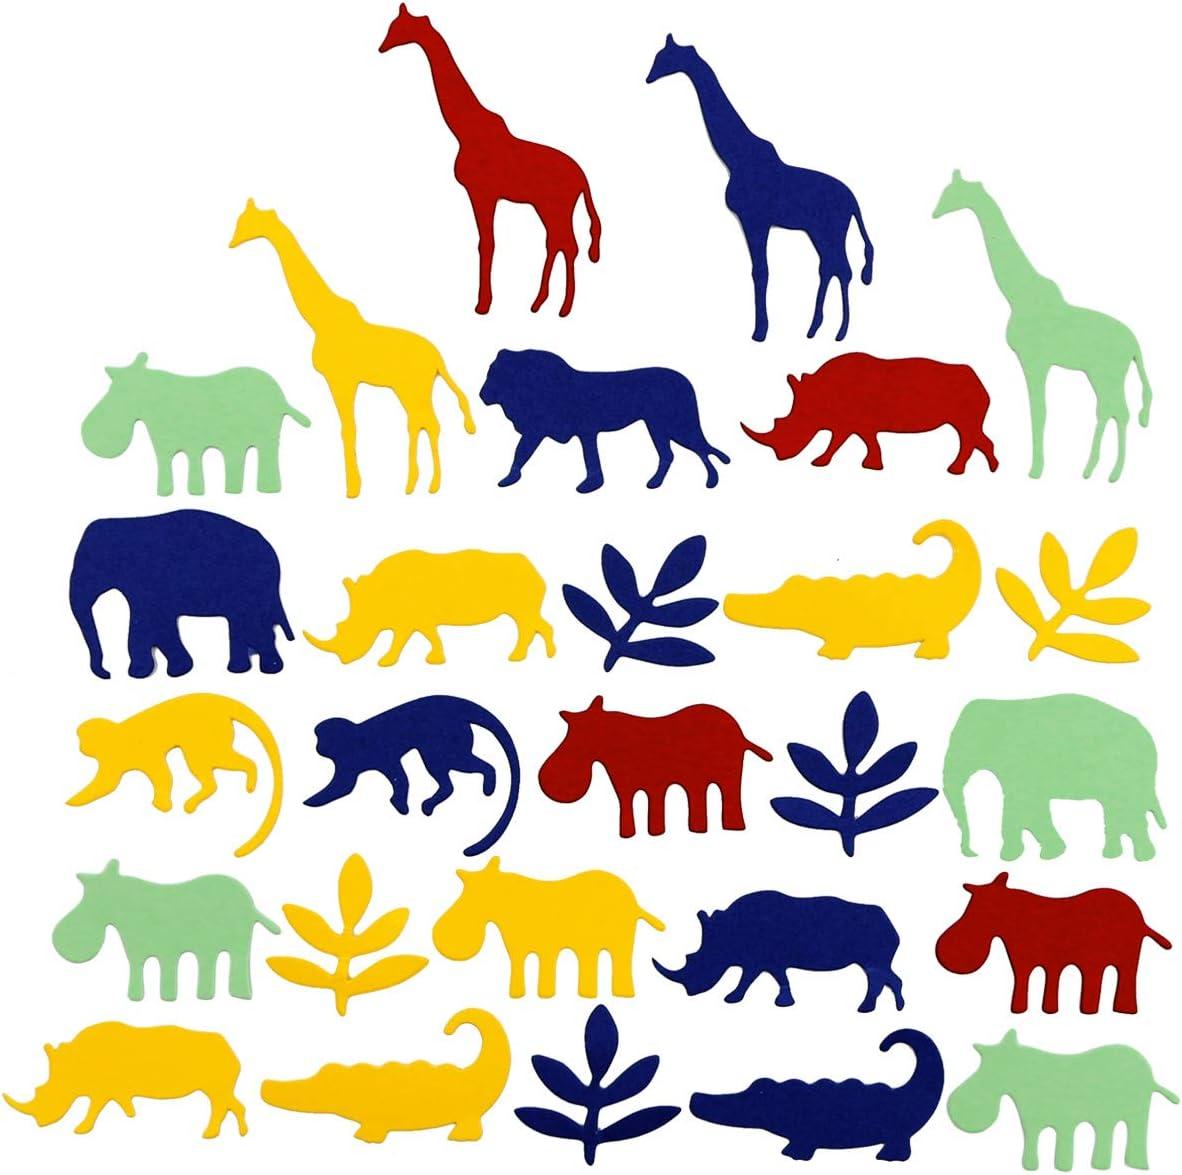 Throwing Confetti Props Oruuum Jungle Animal Confetti 100 Pack. Party Birthday Party Theme Decoration Confetti